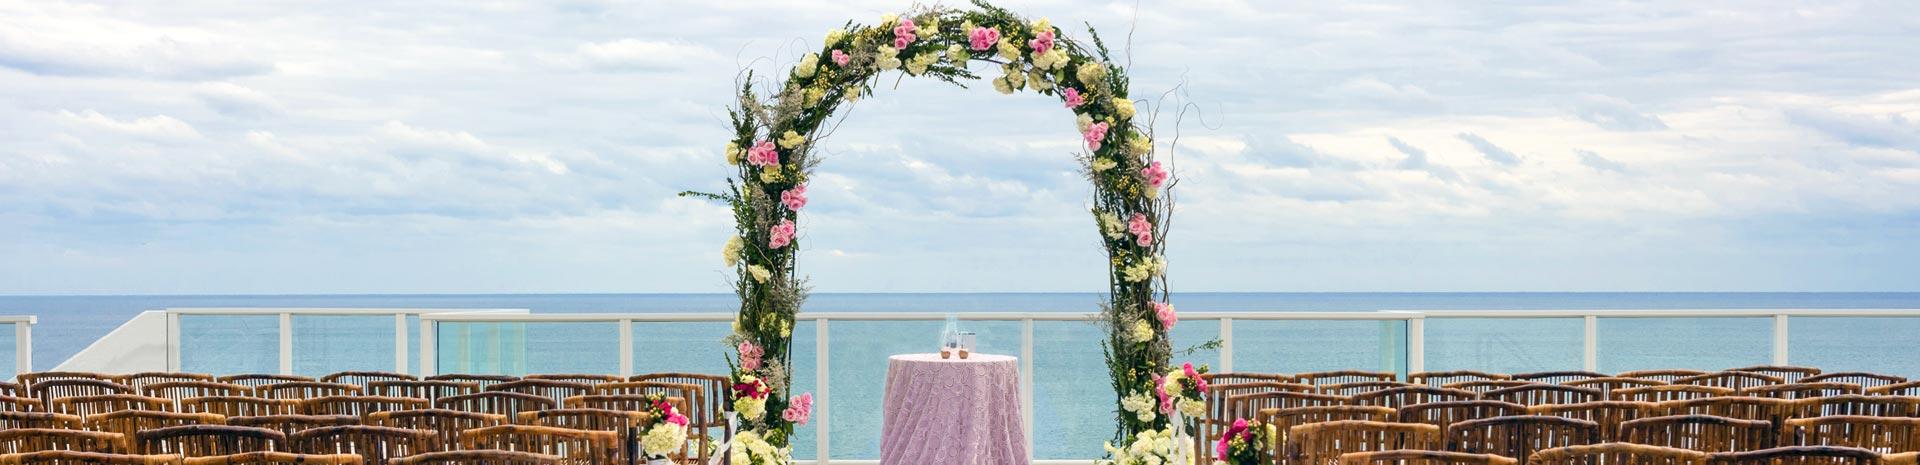 South Florida Beach Wedding | Margaritaville Hollywood Beach Resort